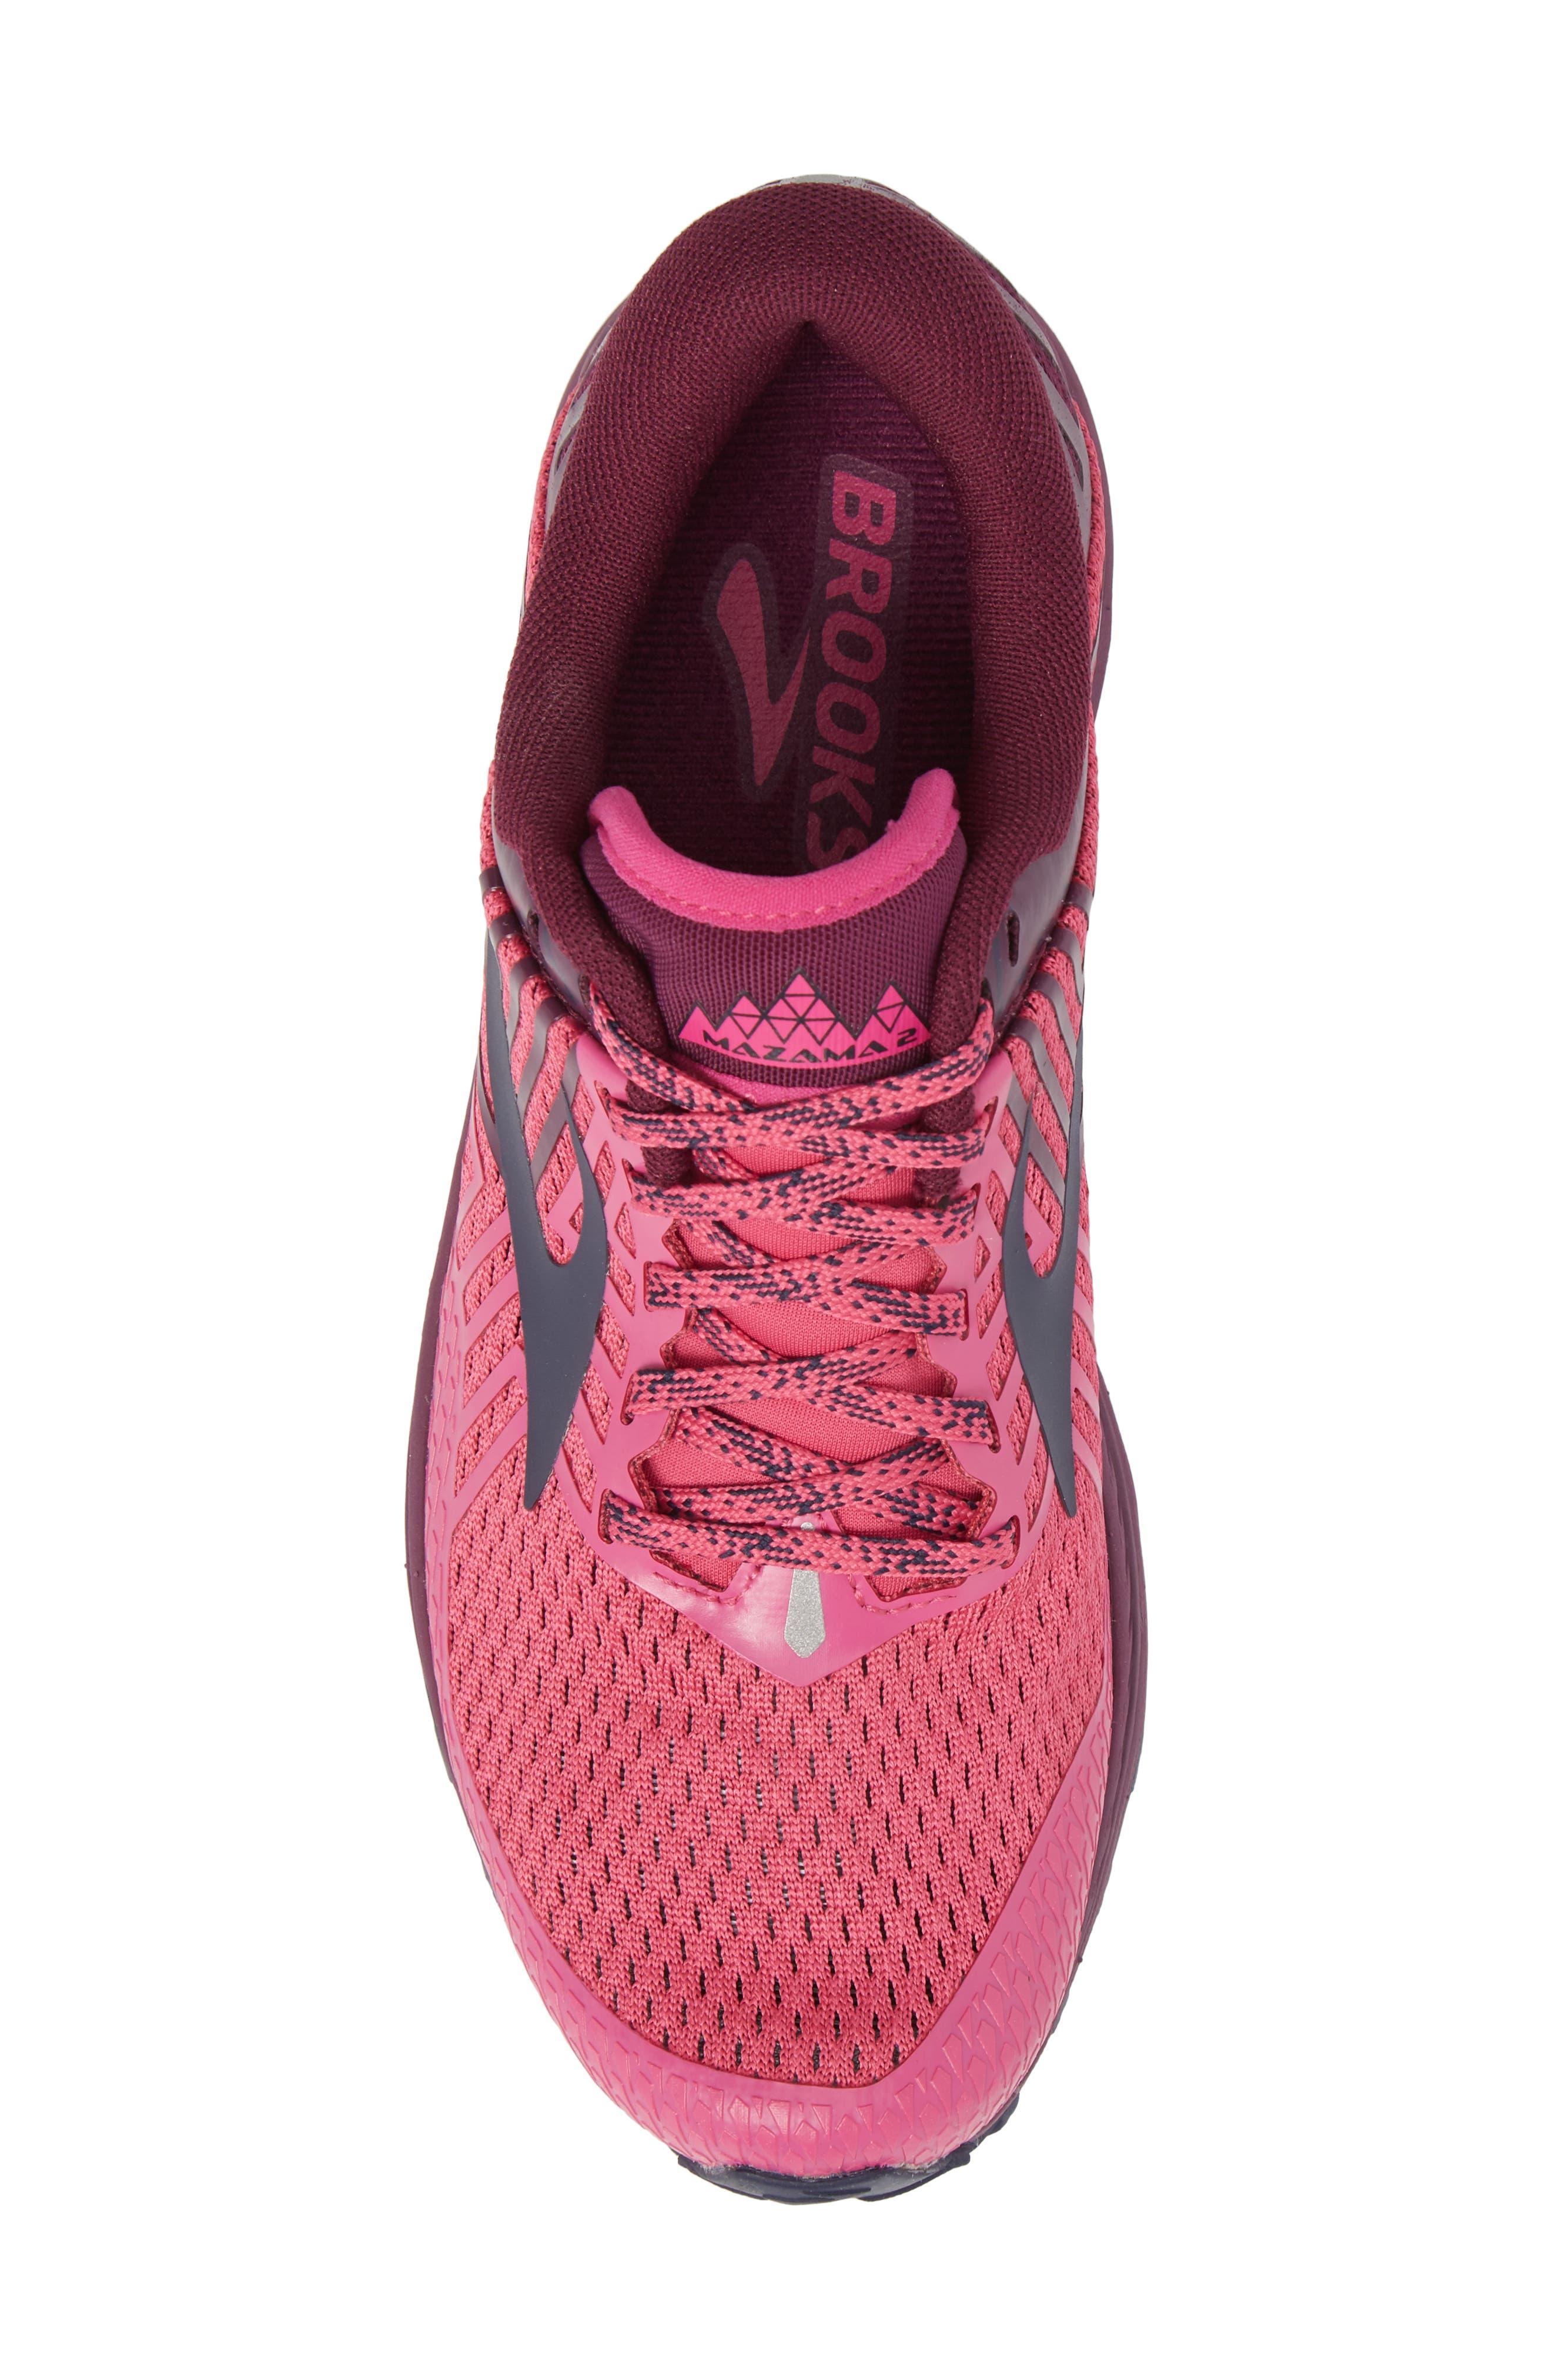 Mazama 2 Trail Running Shoe,                             Alternate thumbnail 5, color,                             PINK/ PLUM/ NAVY